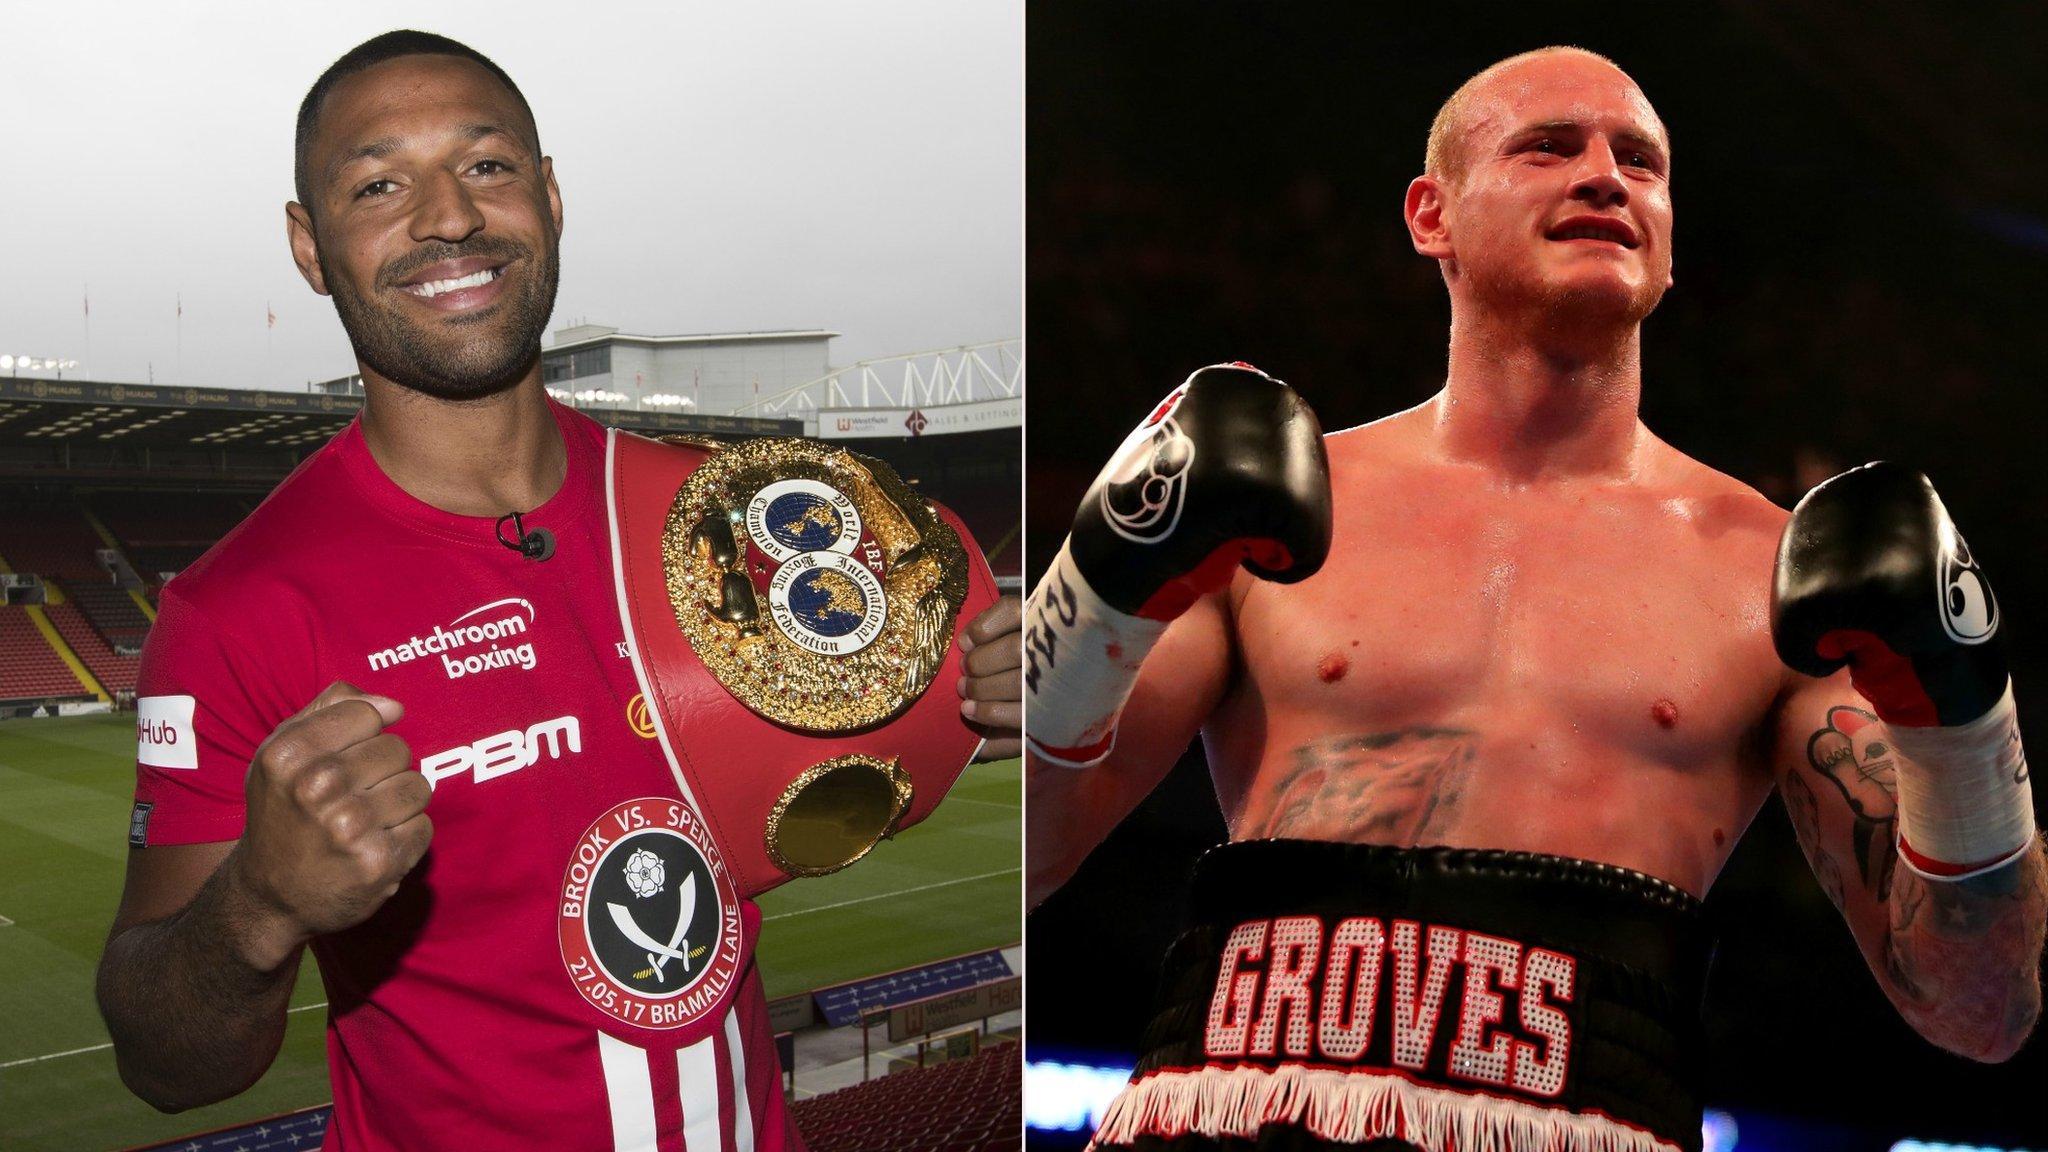 Kell Brook plots Errol Spence shock as George Groves looks to end world title wait